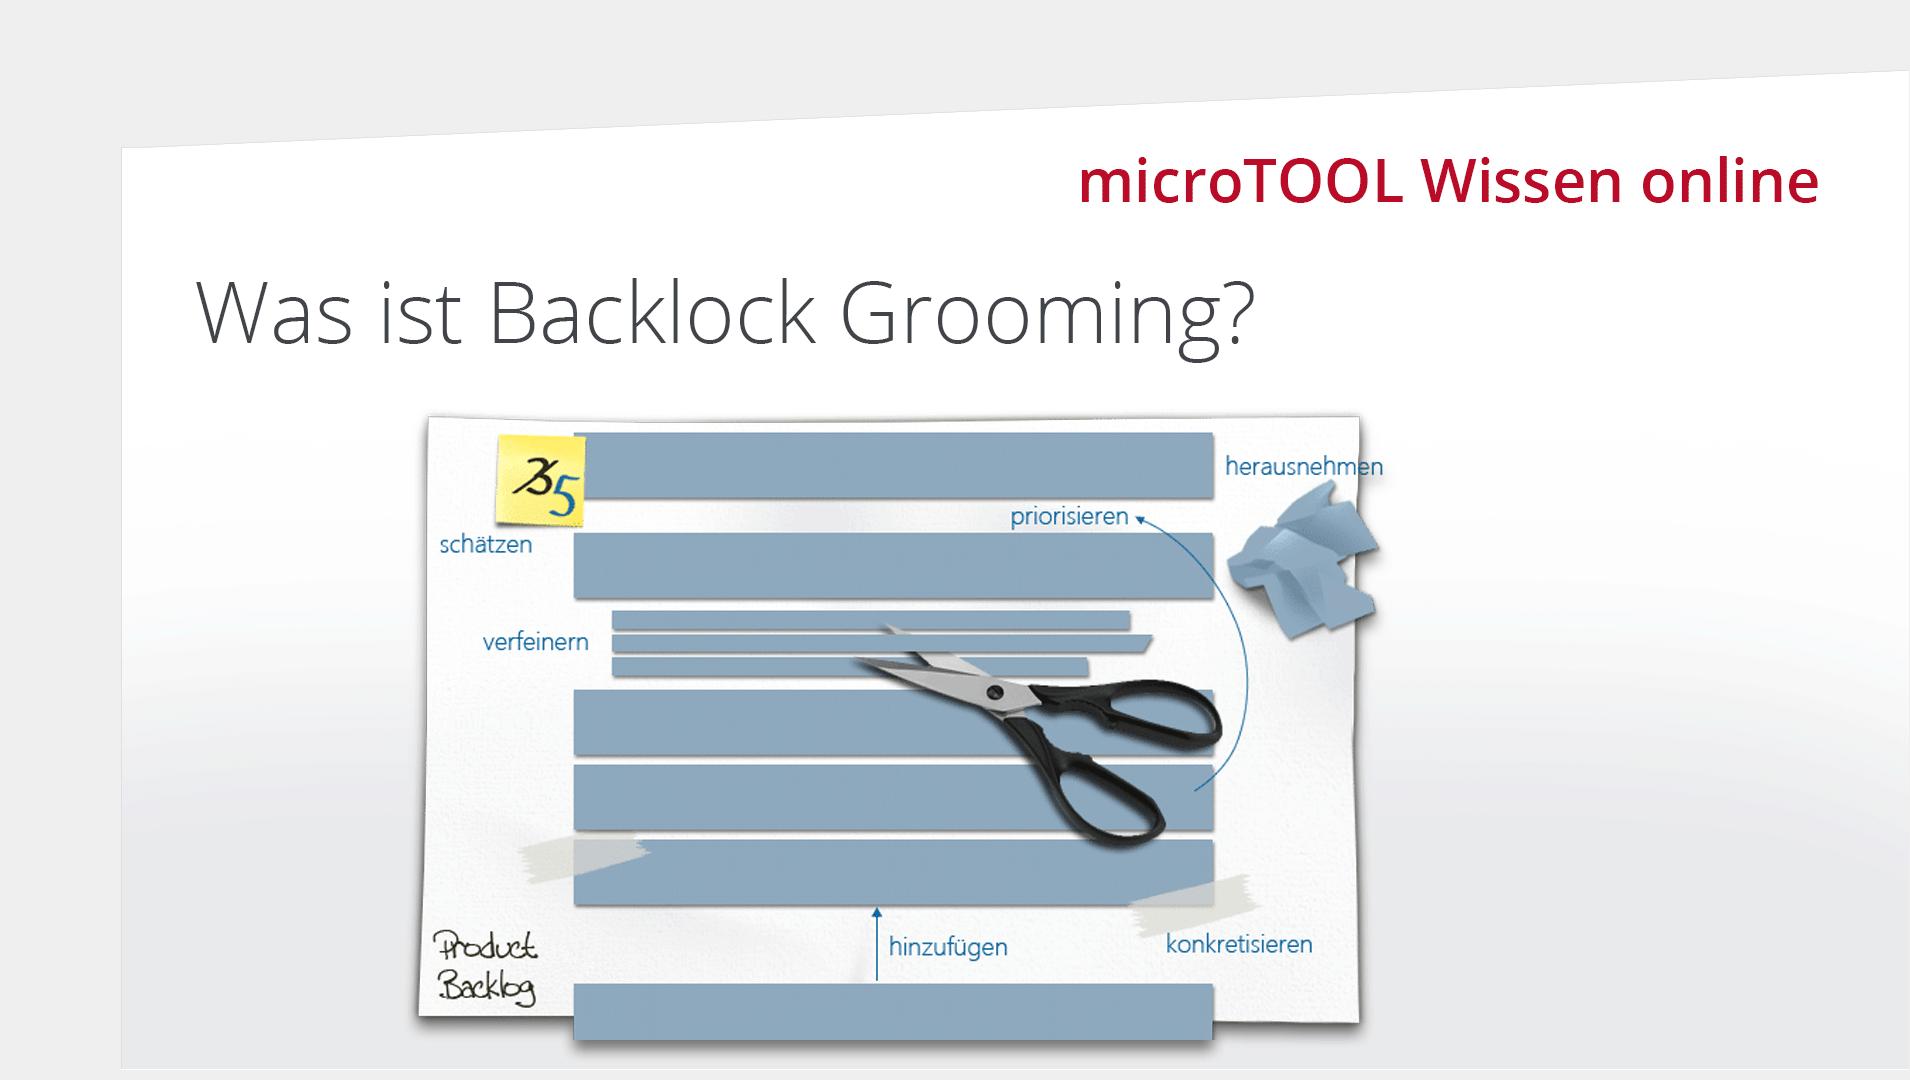 Was ist Backlog Grooming?